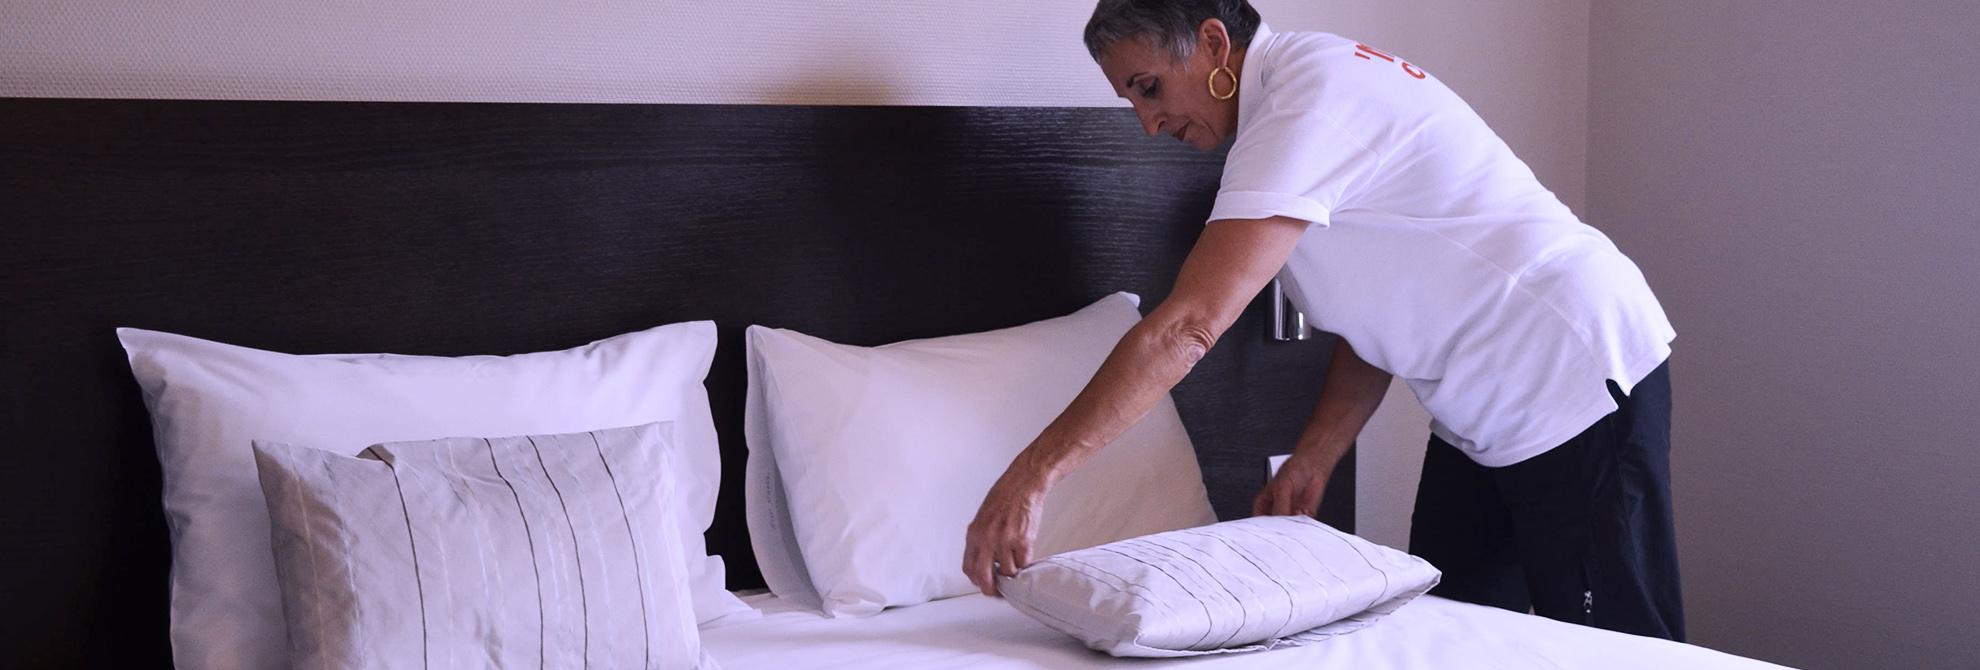 Service de nettoyage professionnel Hotel